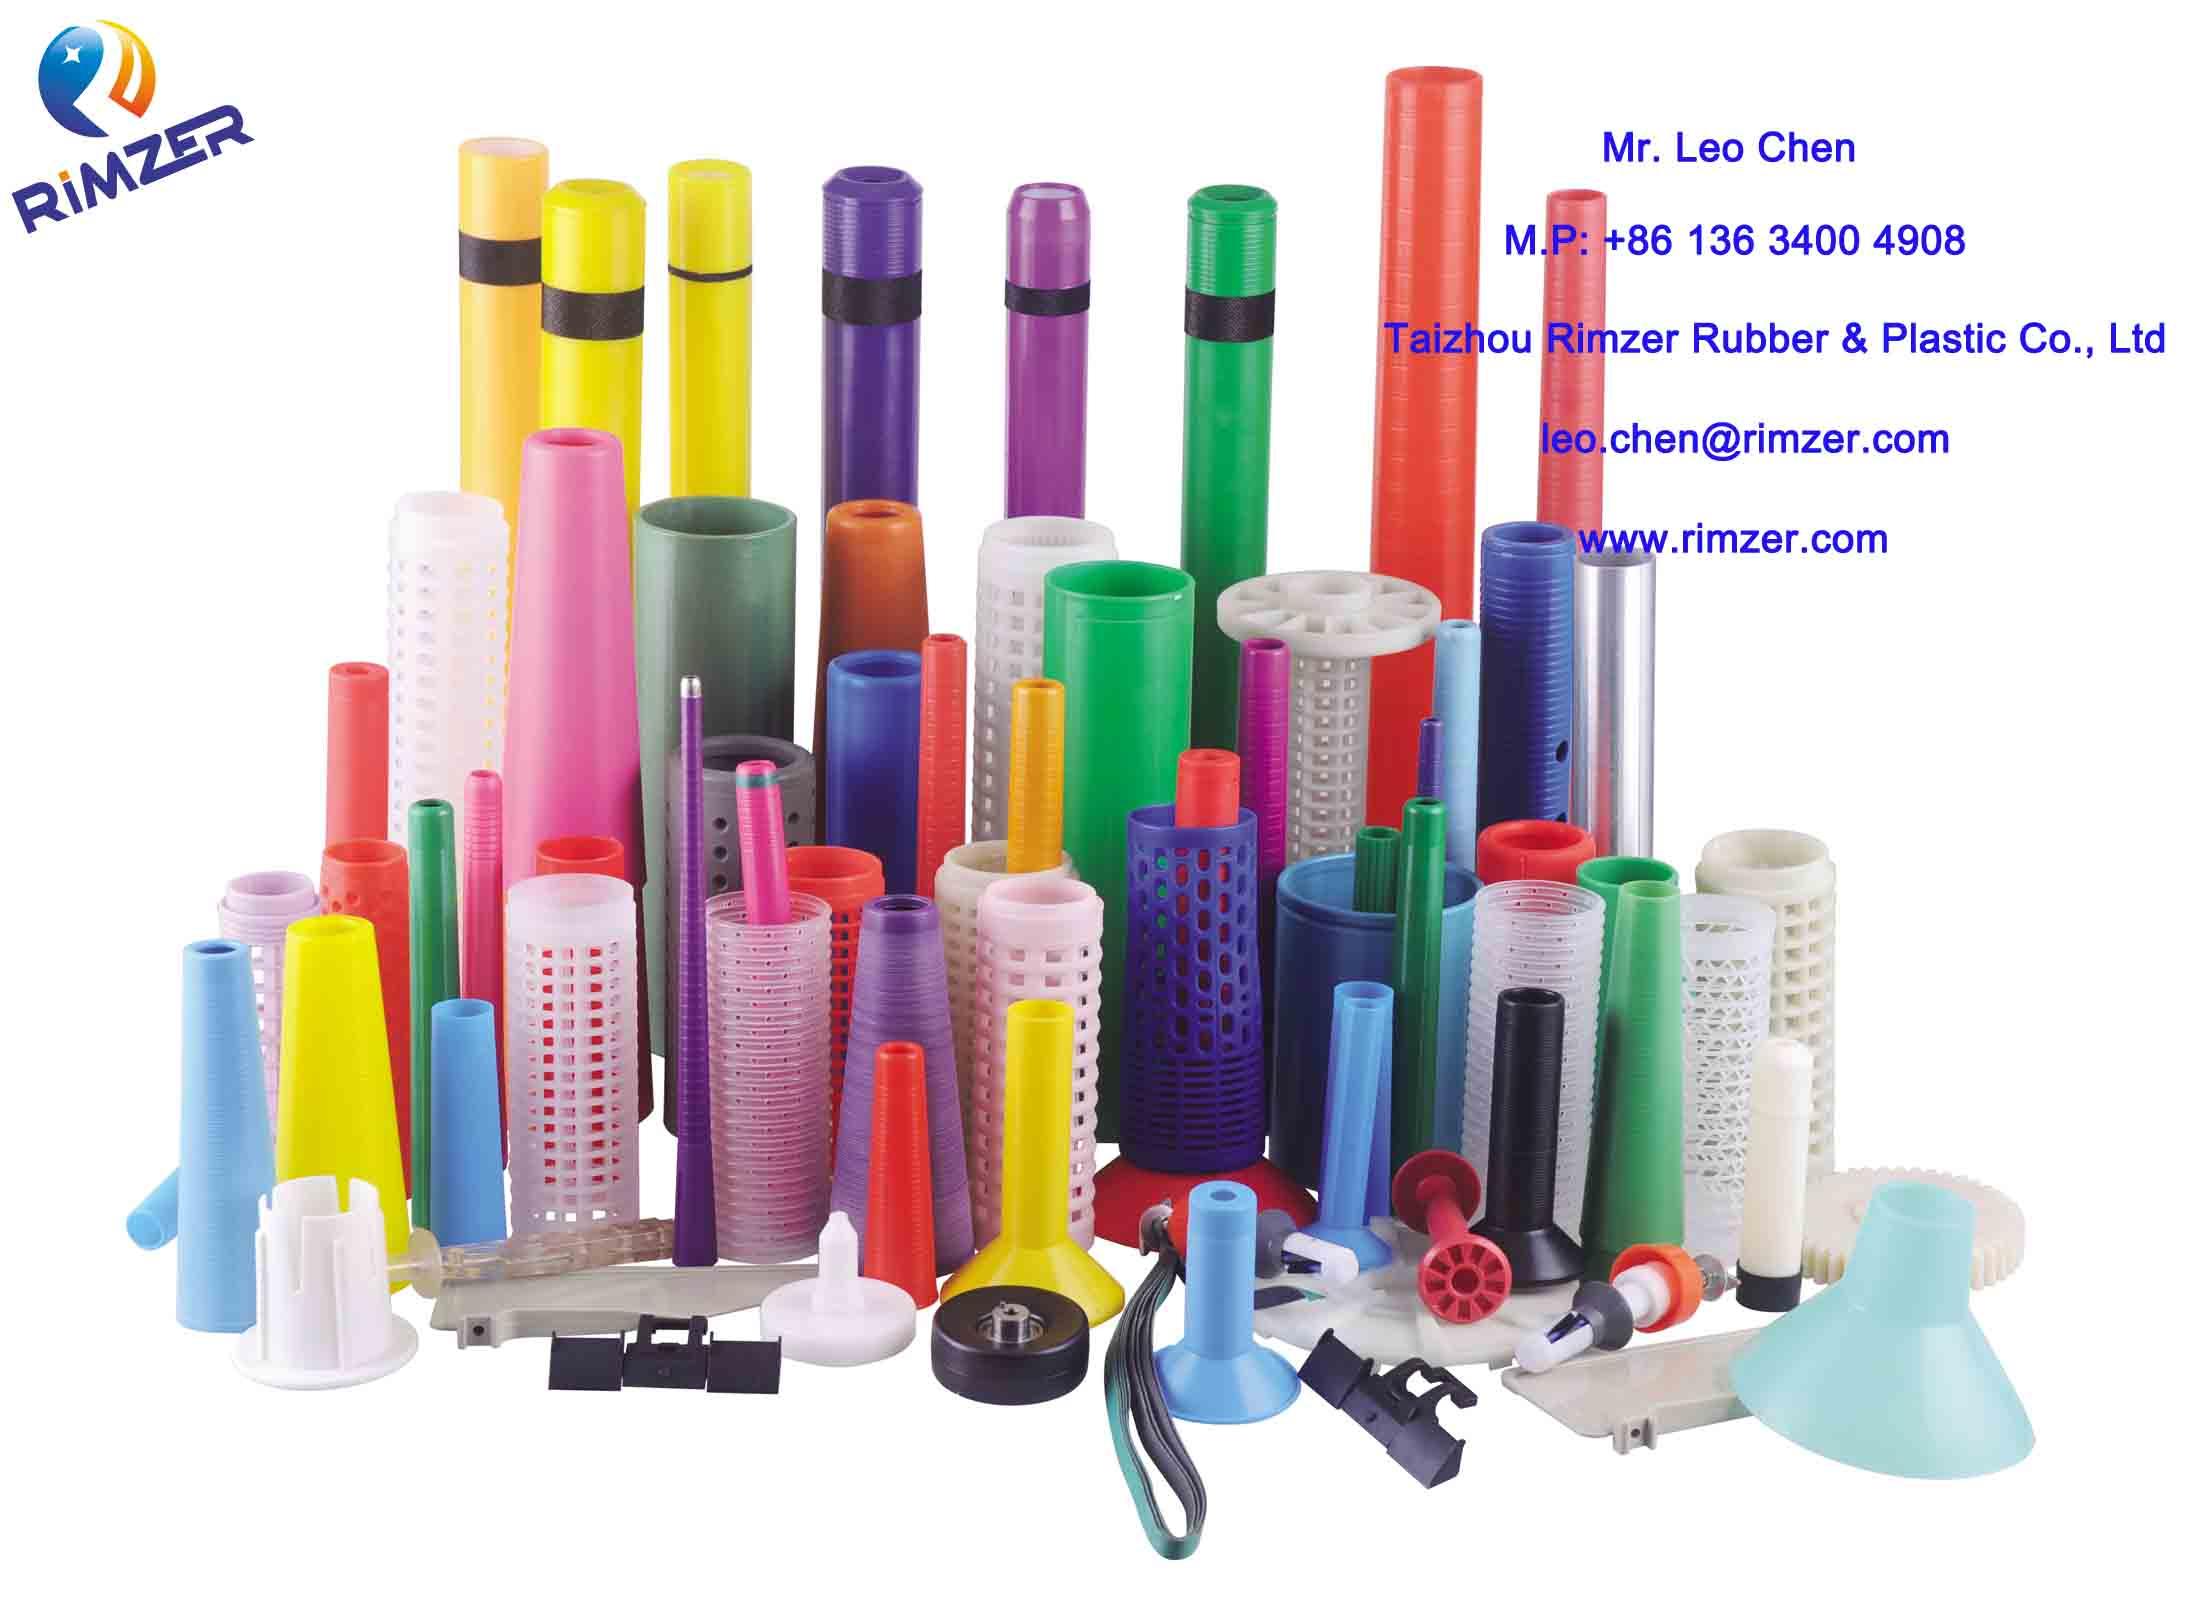 Taizhou Rimzer Rubber & Plastic Co., Ltd Main Image